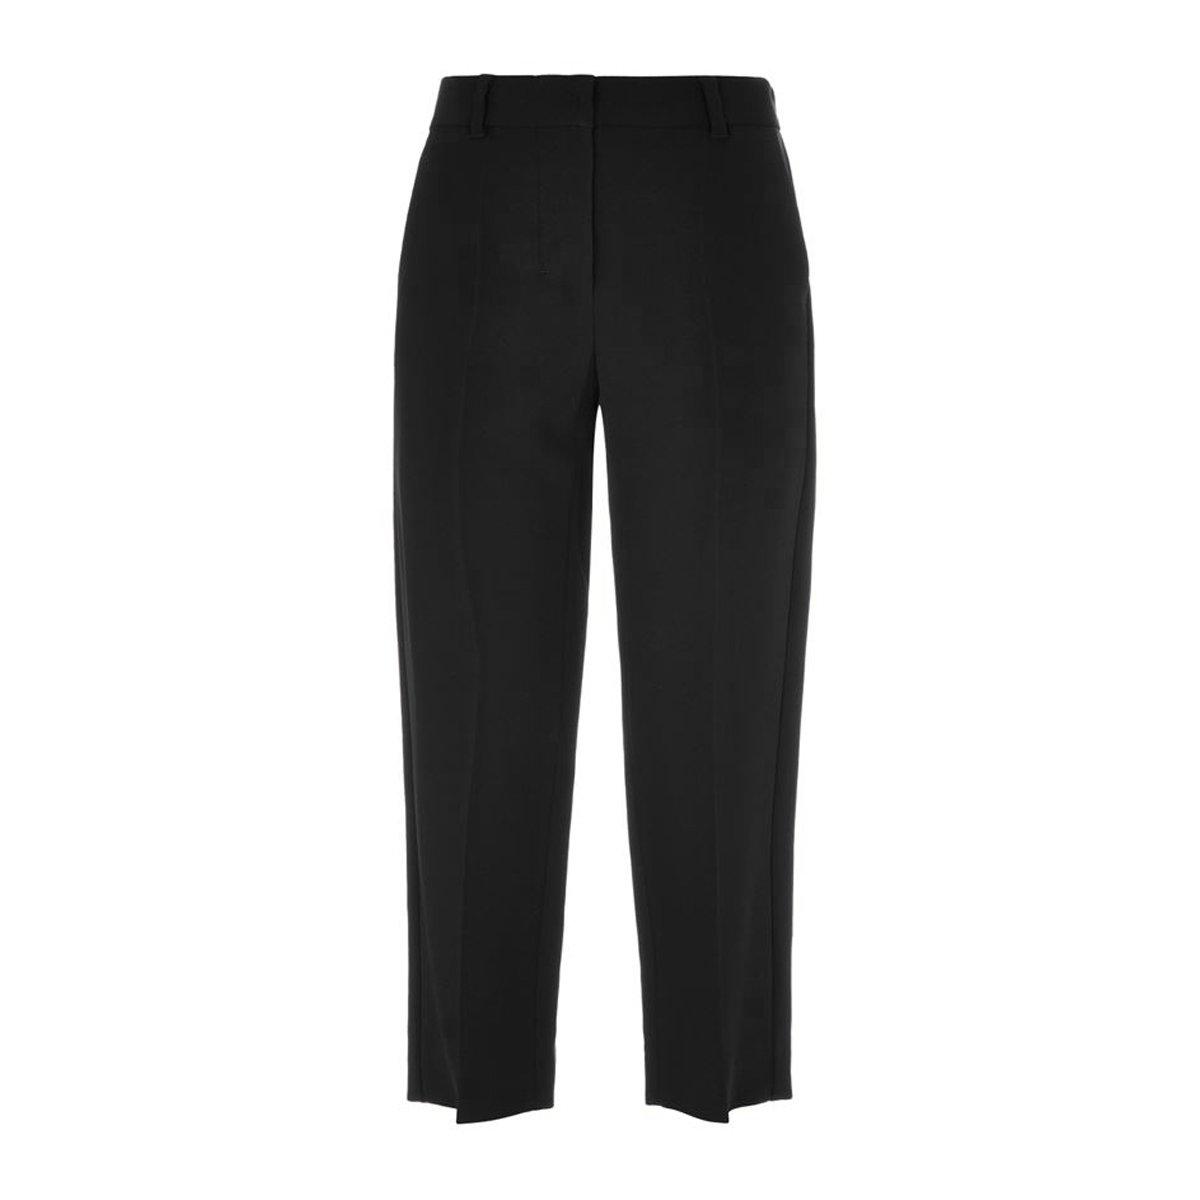 'S Max Mara Women's Alaska Cropped Trousers Sz 6 Black